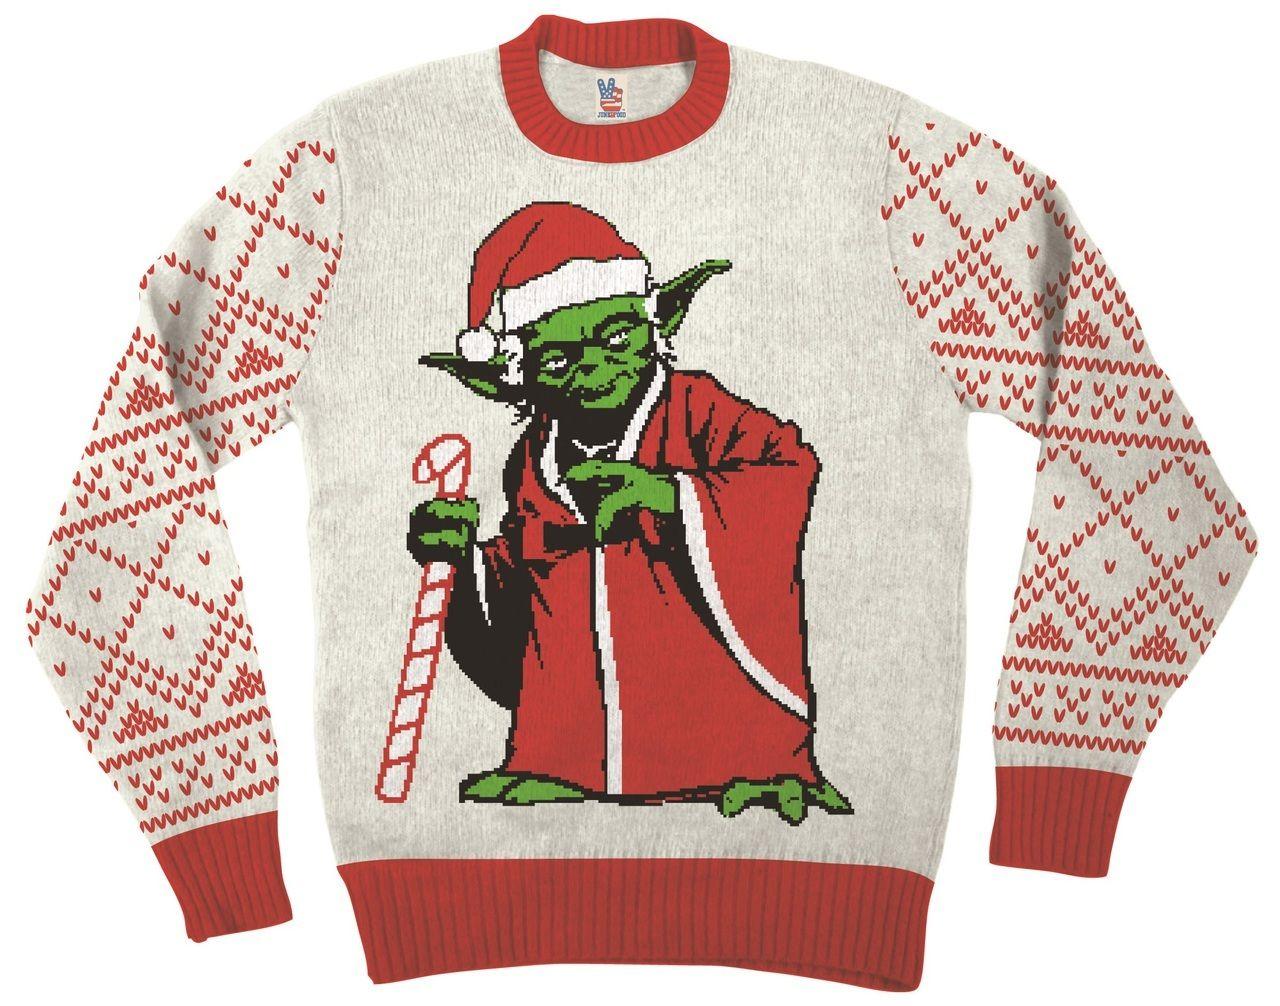 b5ea4eedea1e Star Wars Jedi Yoda Dressed As Santa Ugly Christmas Sweater ...